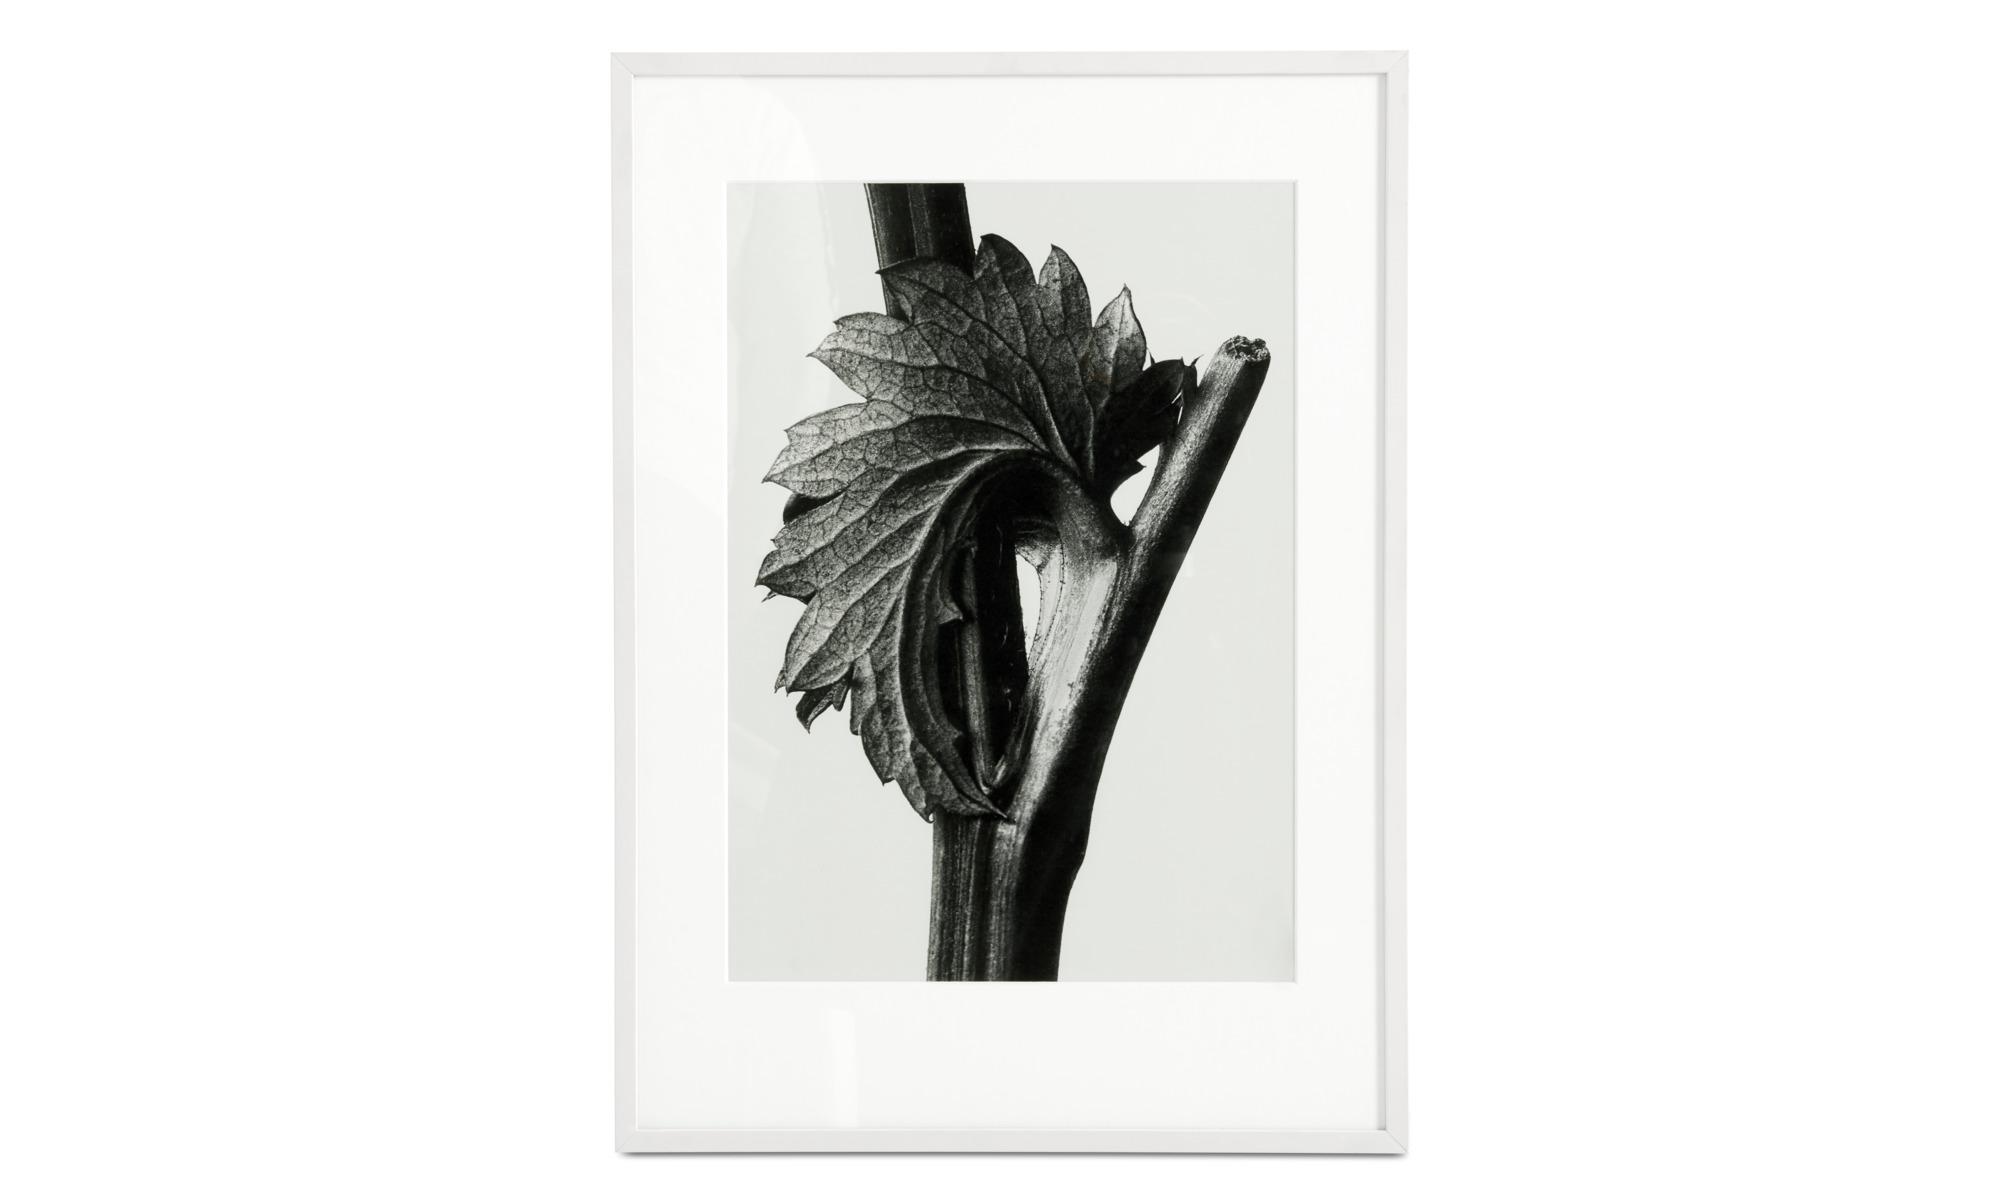 Gallery - Canadian Burnet framed art - Black - Wood